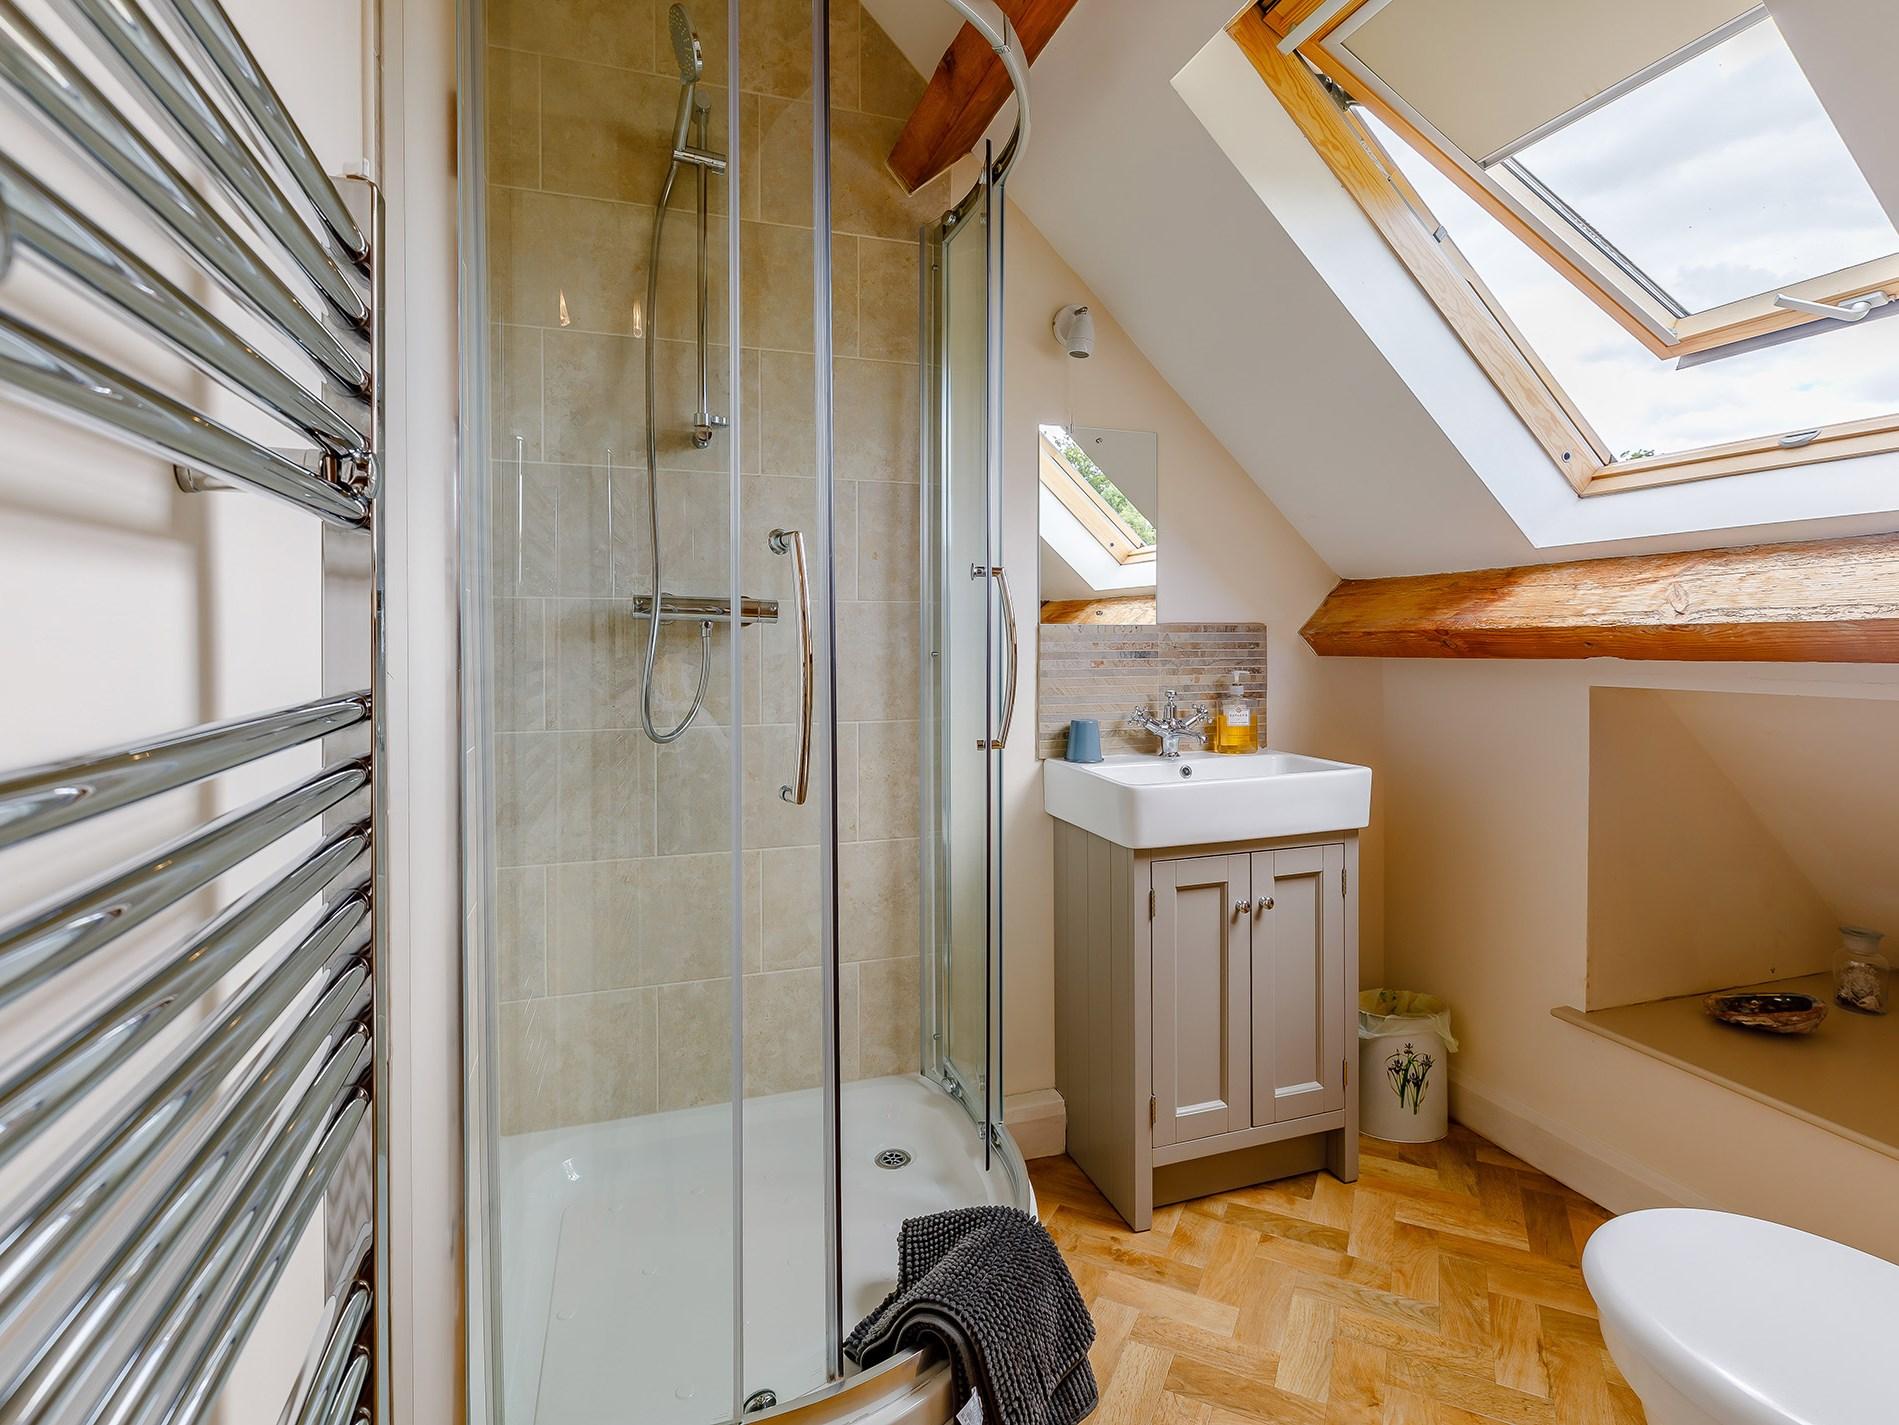 4 Bedroom Cottage in Ludlow, Heart of England